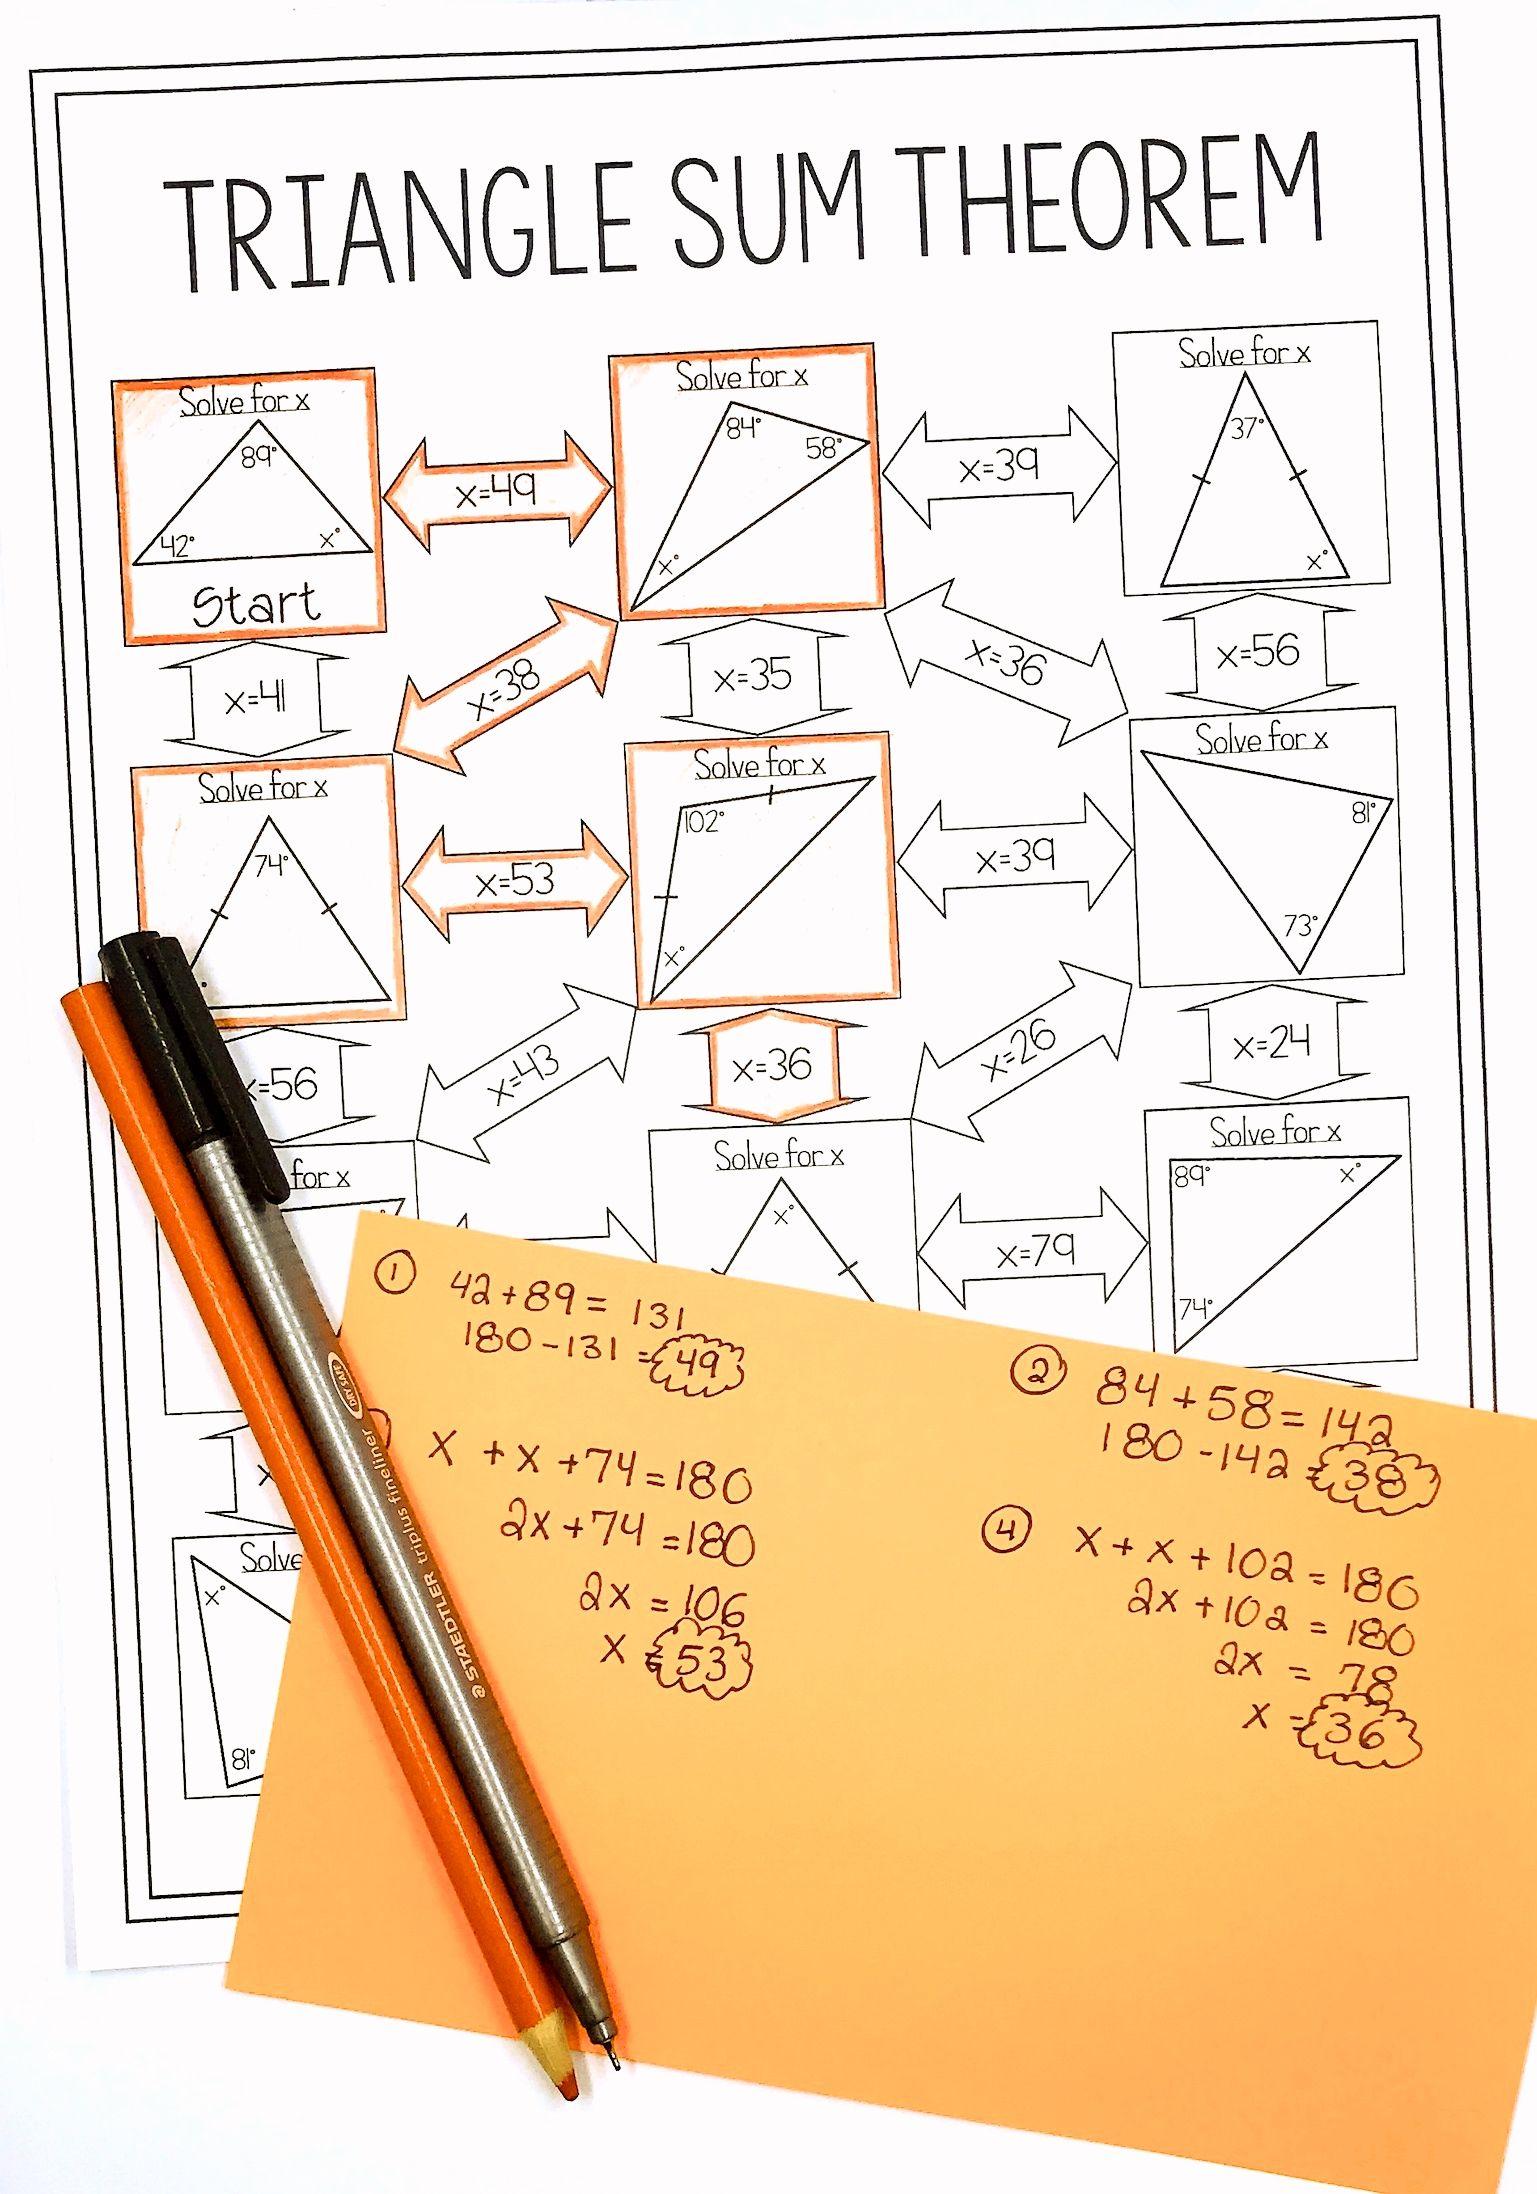 Triangle Sum Theorem Maze – Triangle Sum Theorem Worksheet